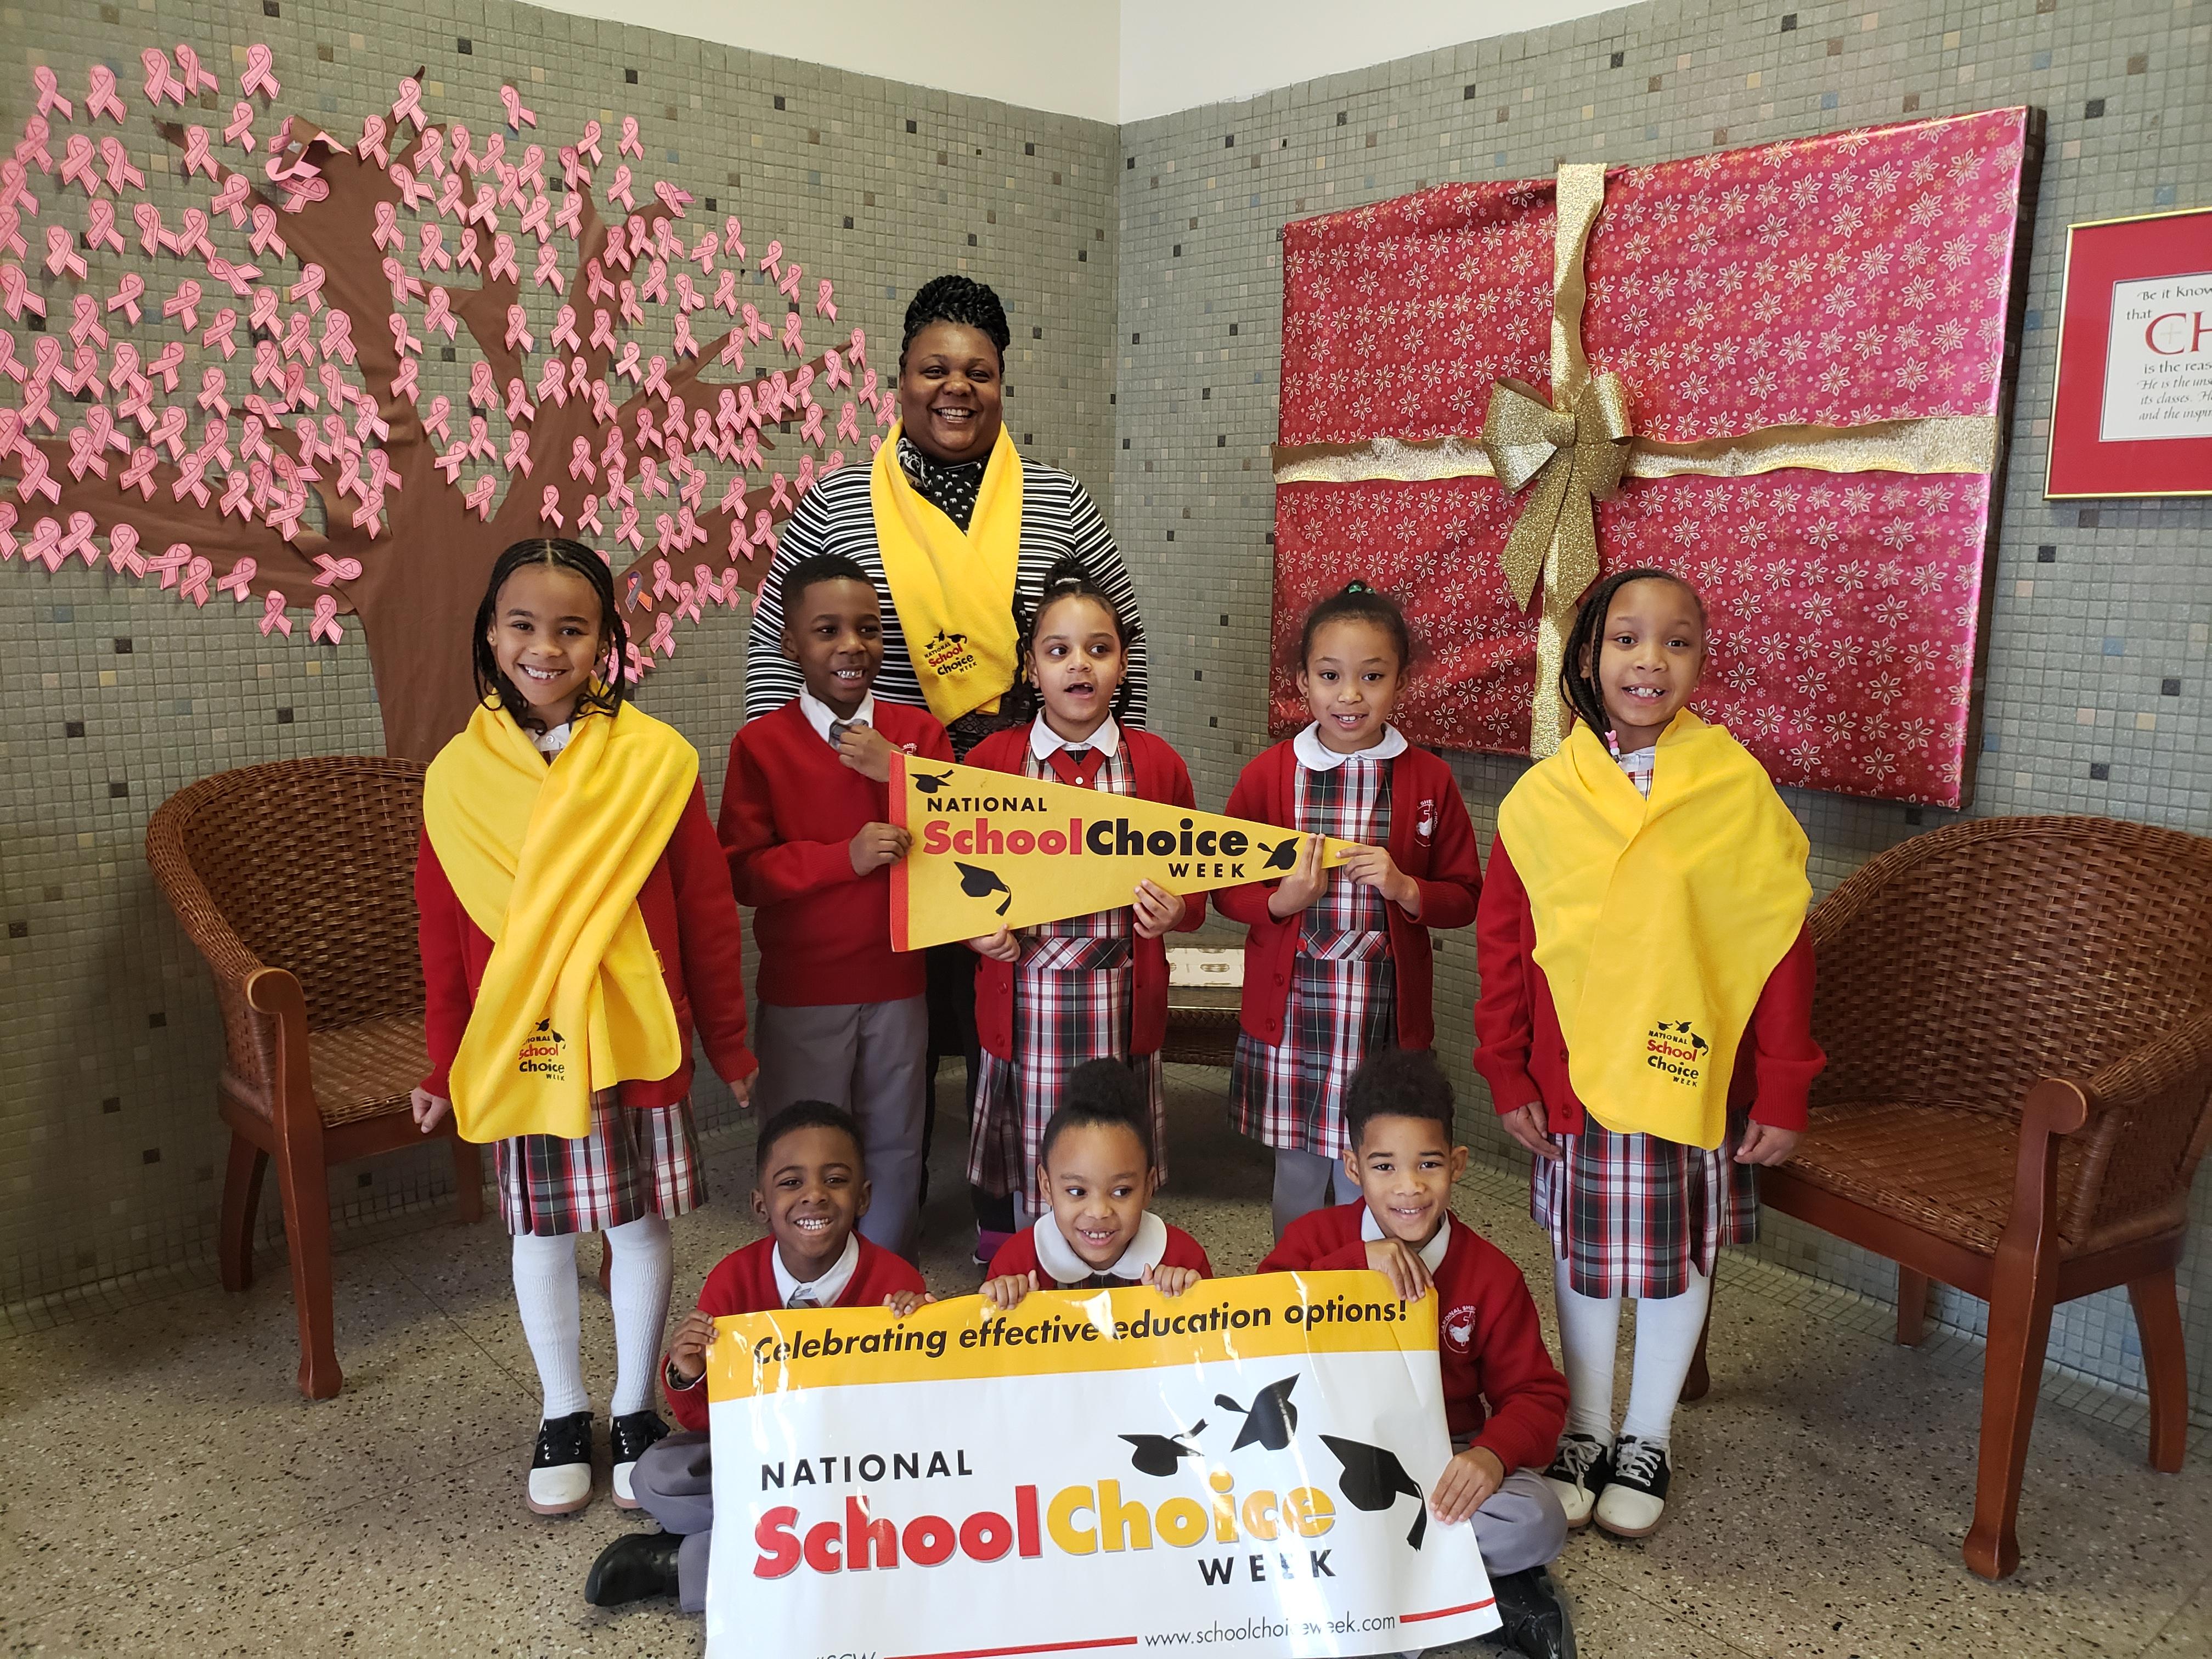 CSFB celebrates school choice at a schoo